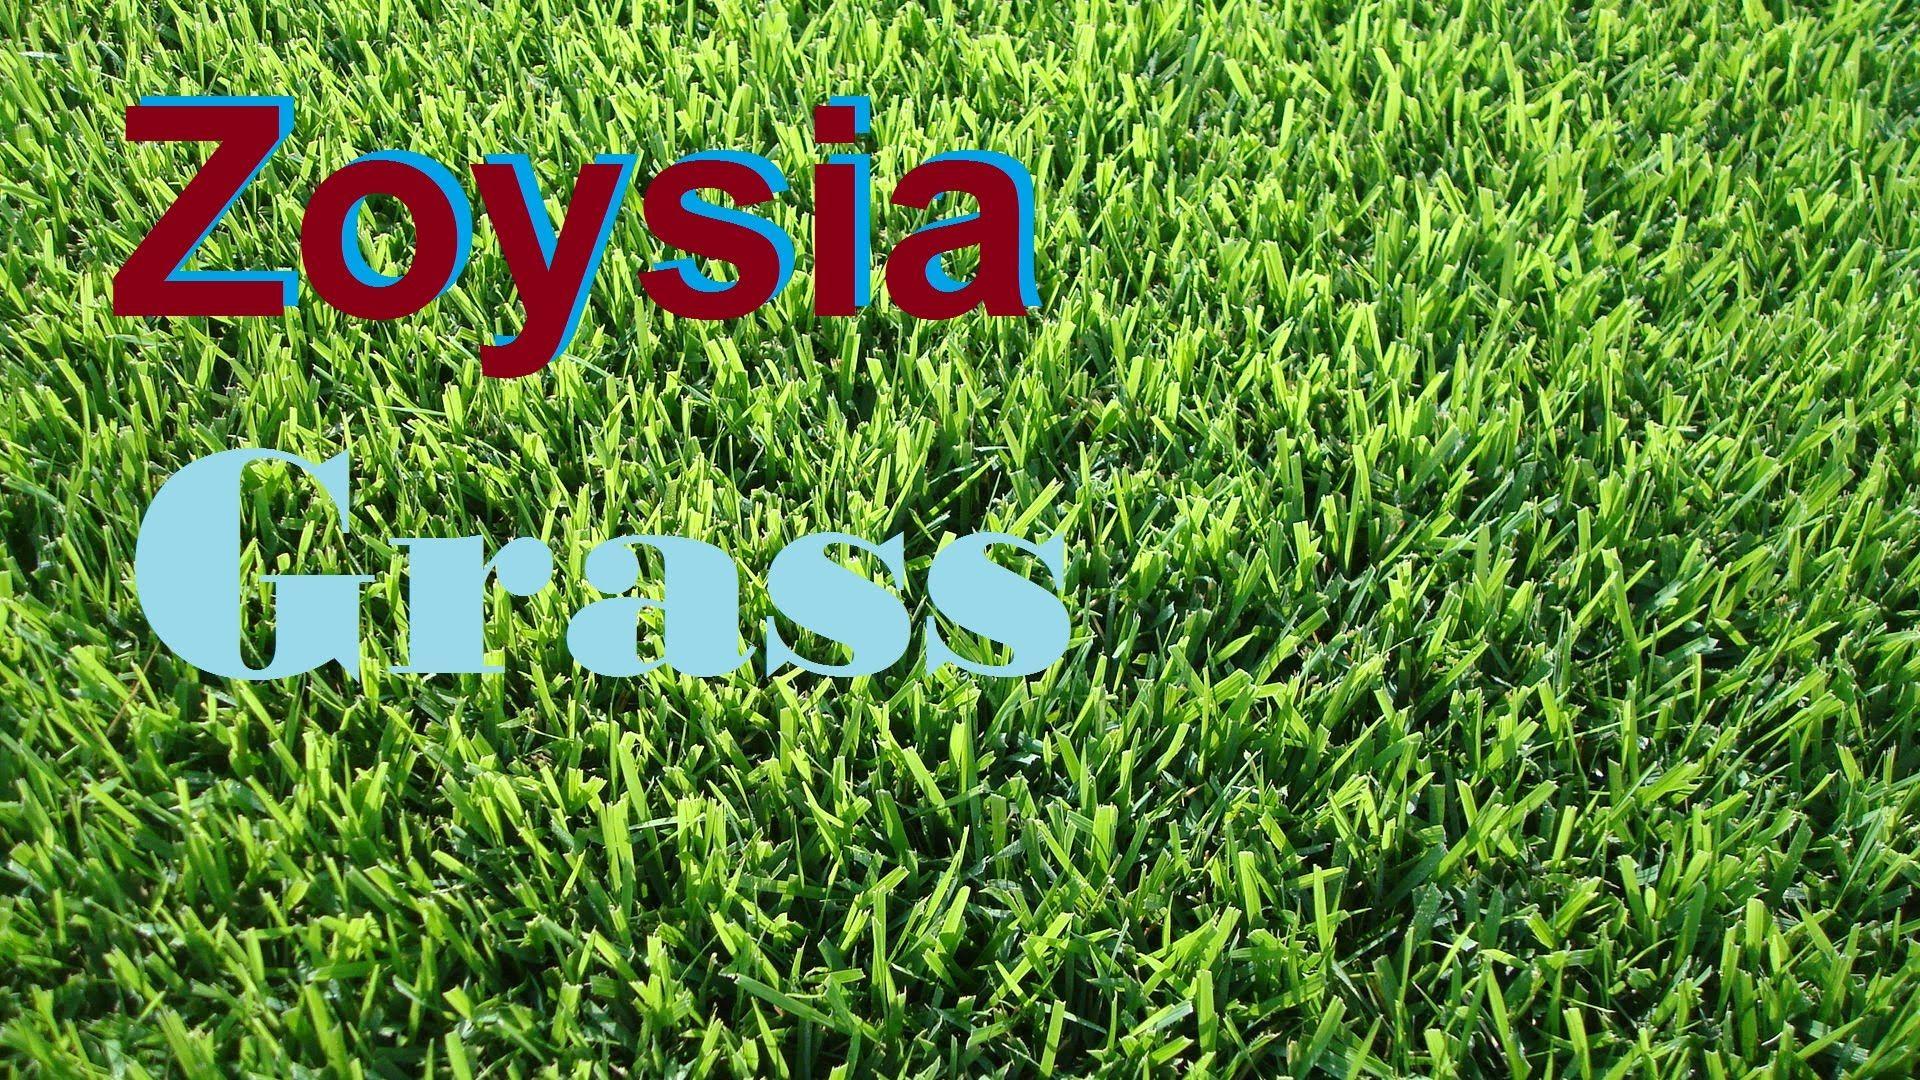 [What Grass Is That] [Zoysia Grass] [Empire Zoysia] [Zeon